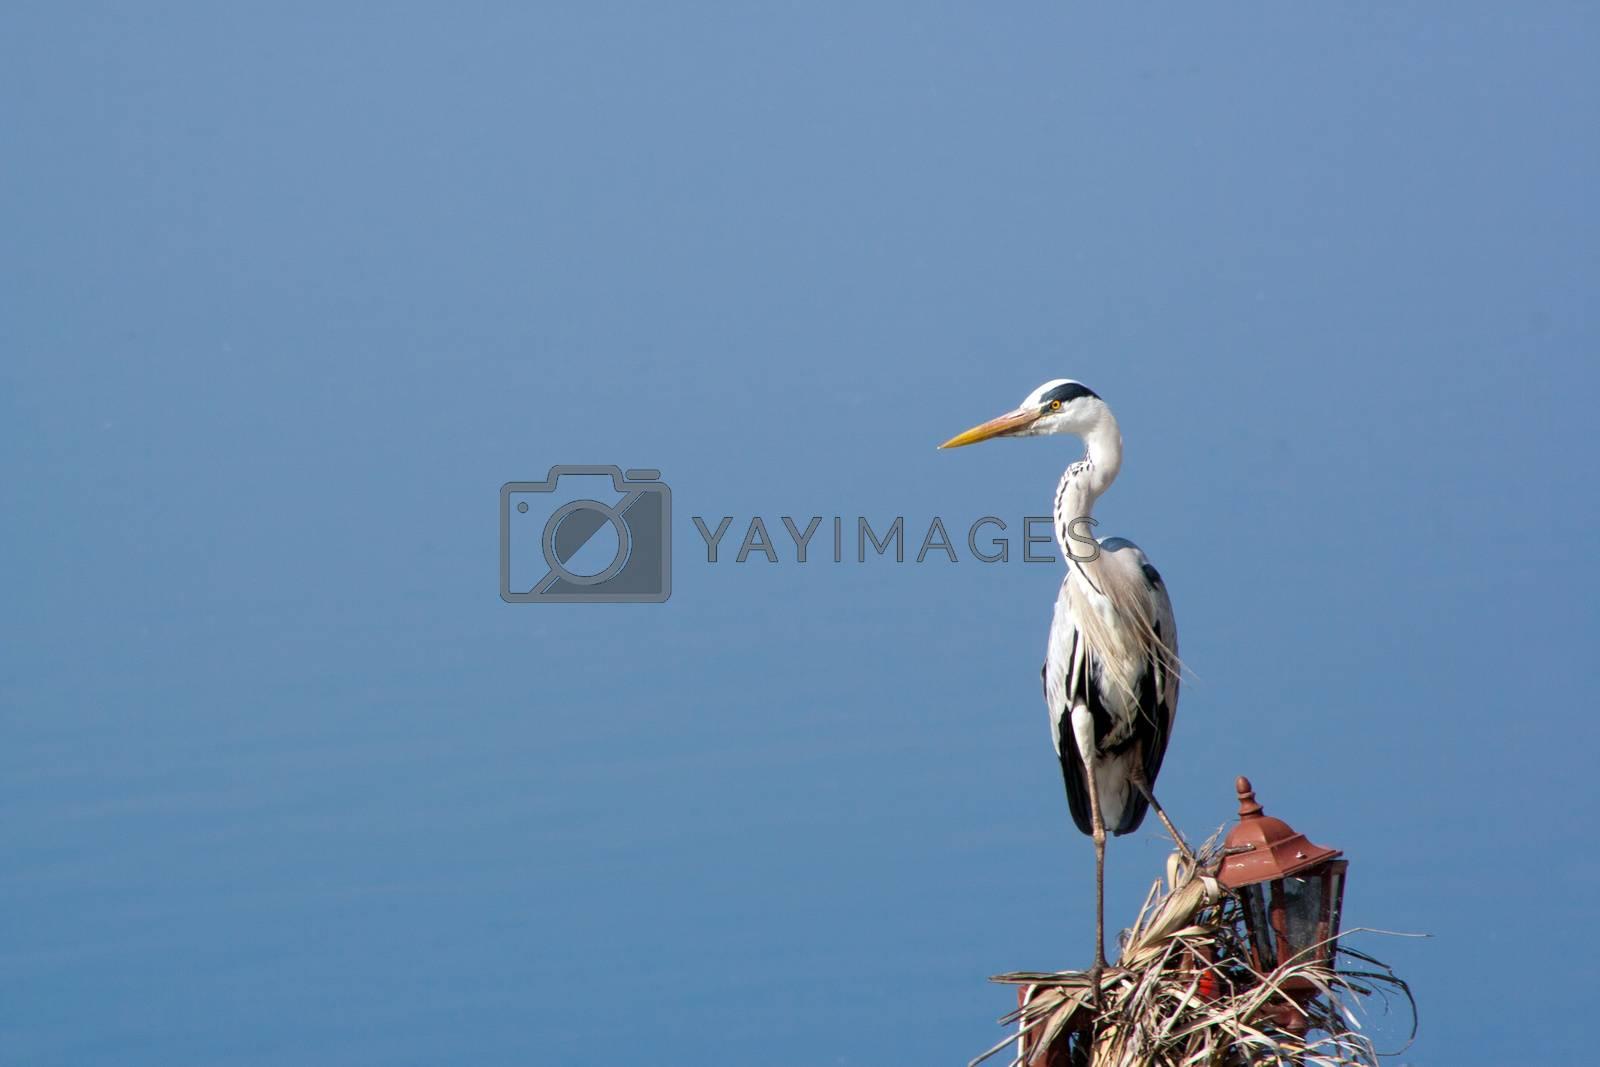 Royalty free image of Heron by elaplan